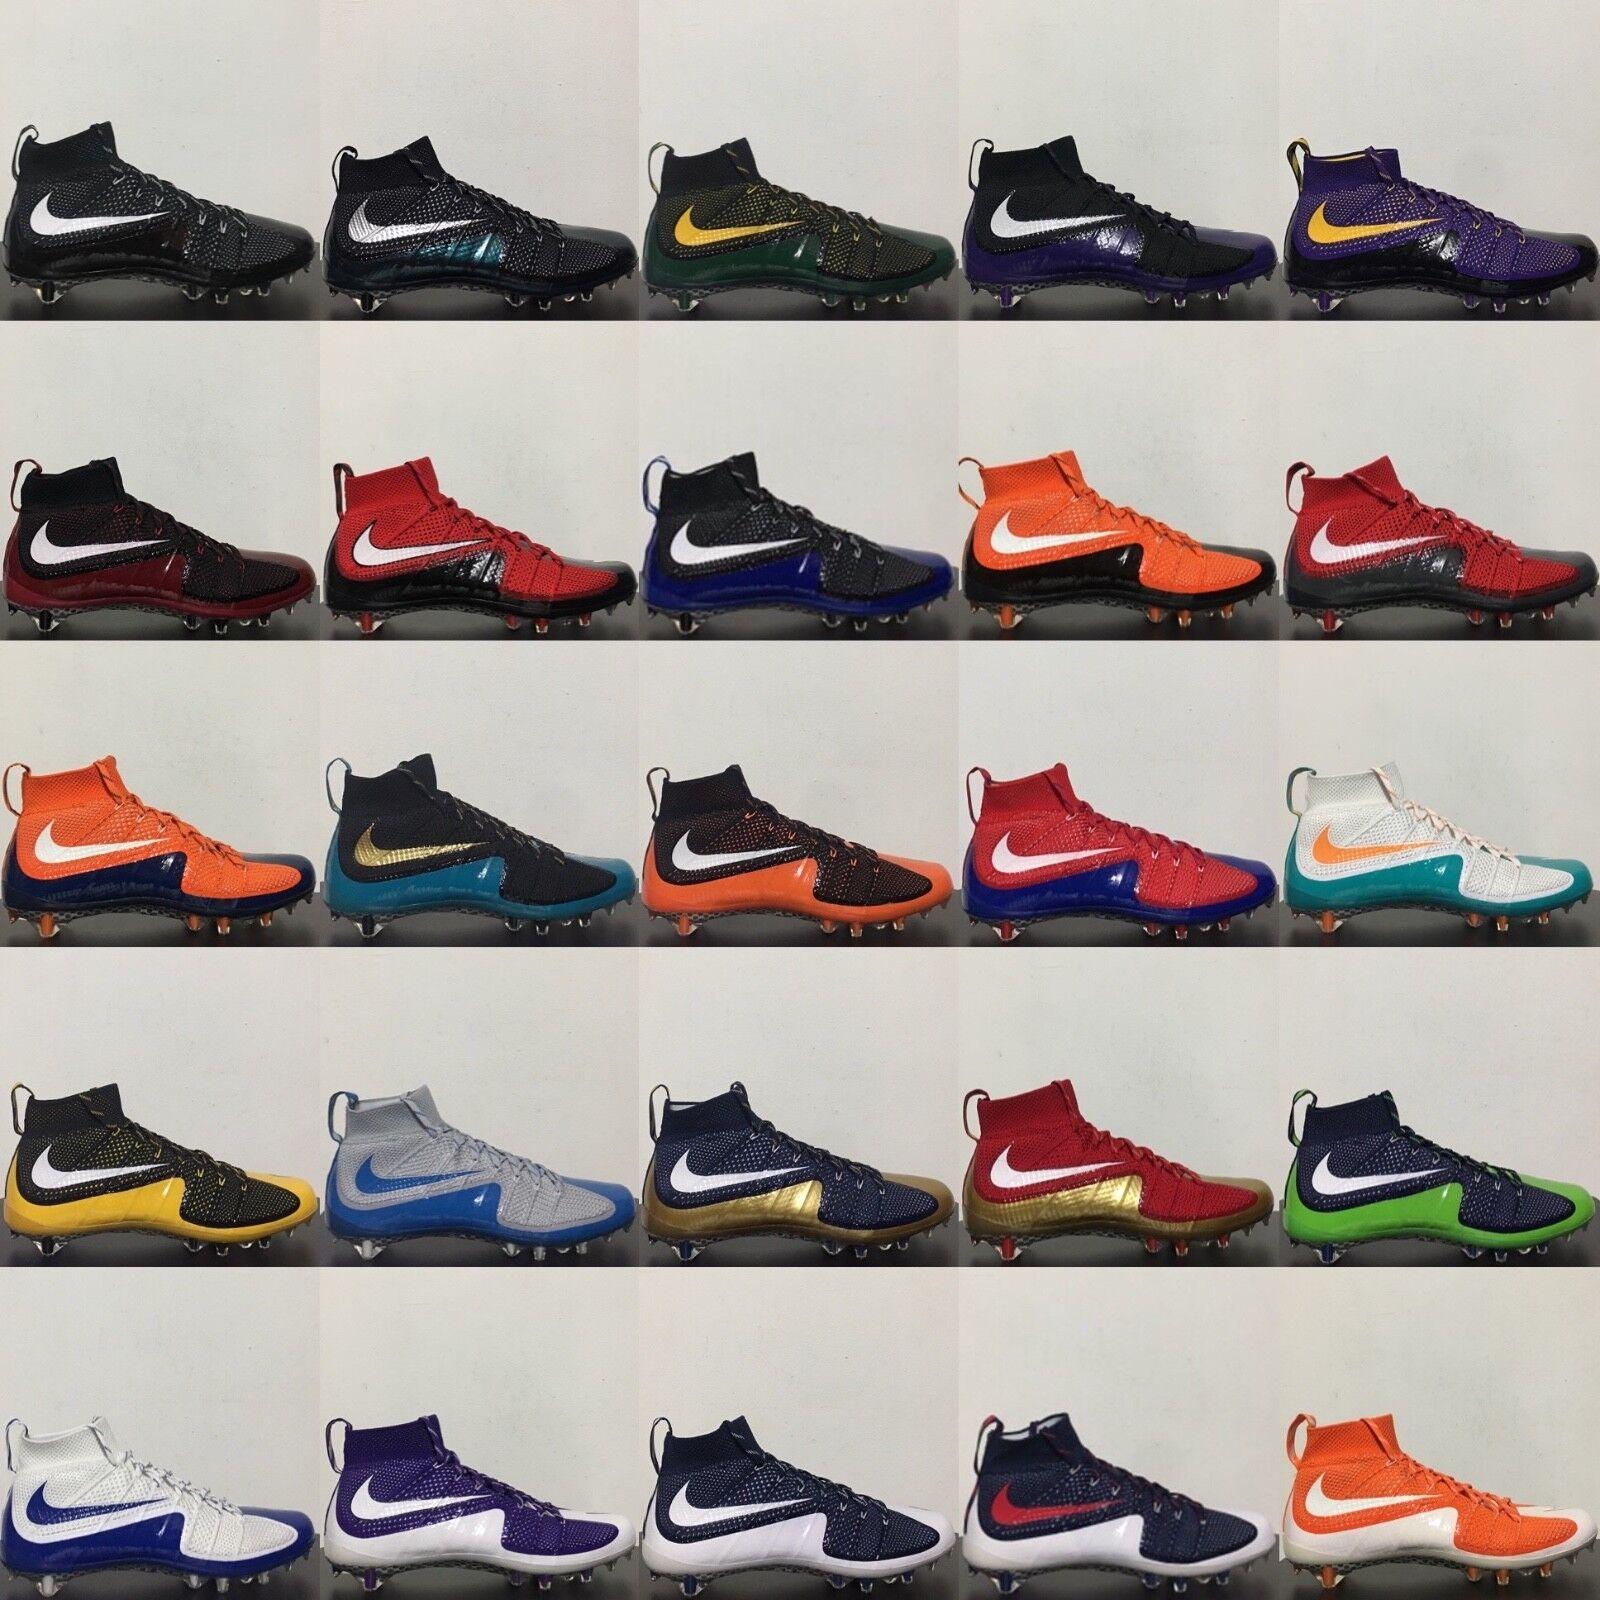 Nike Vapor Untouchable TD Football